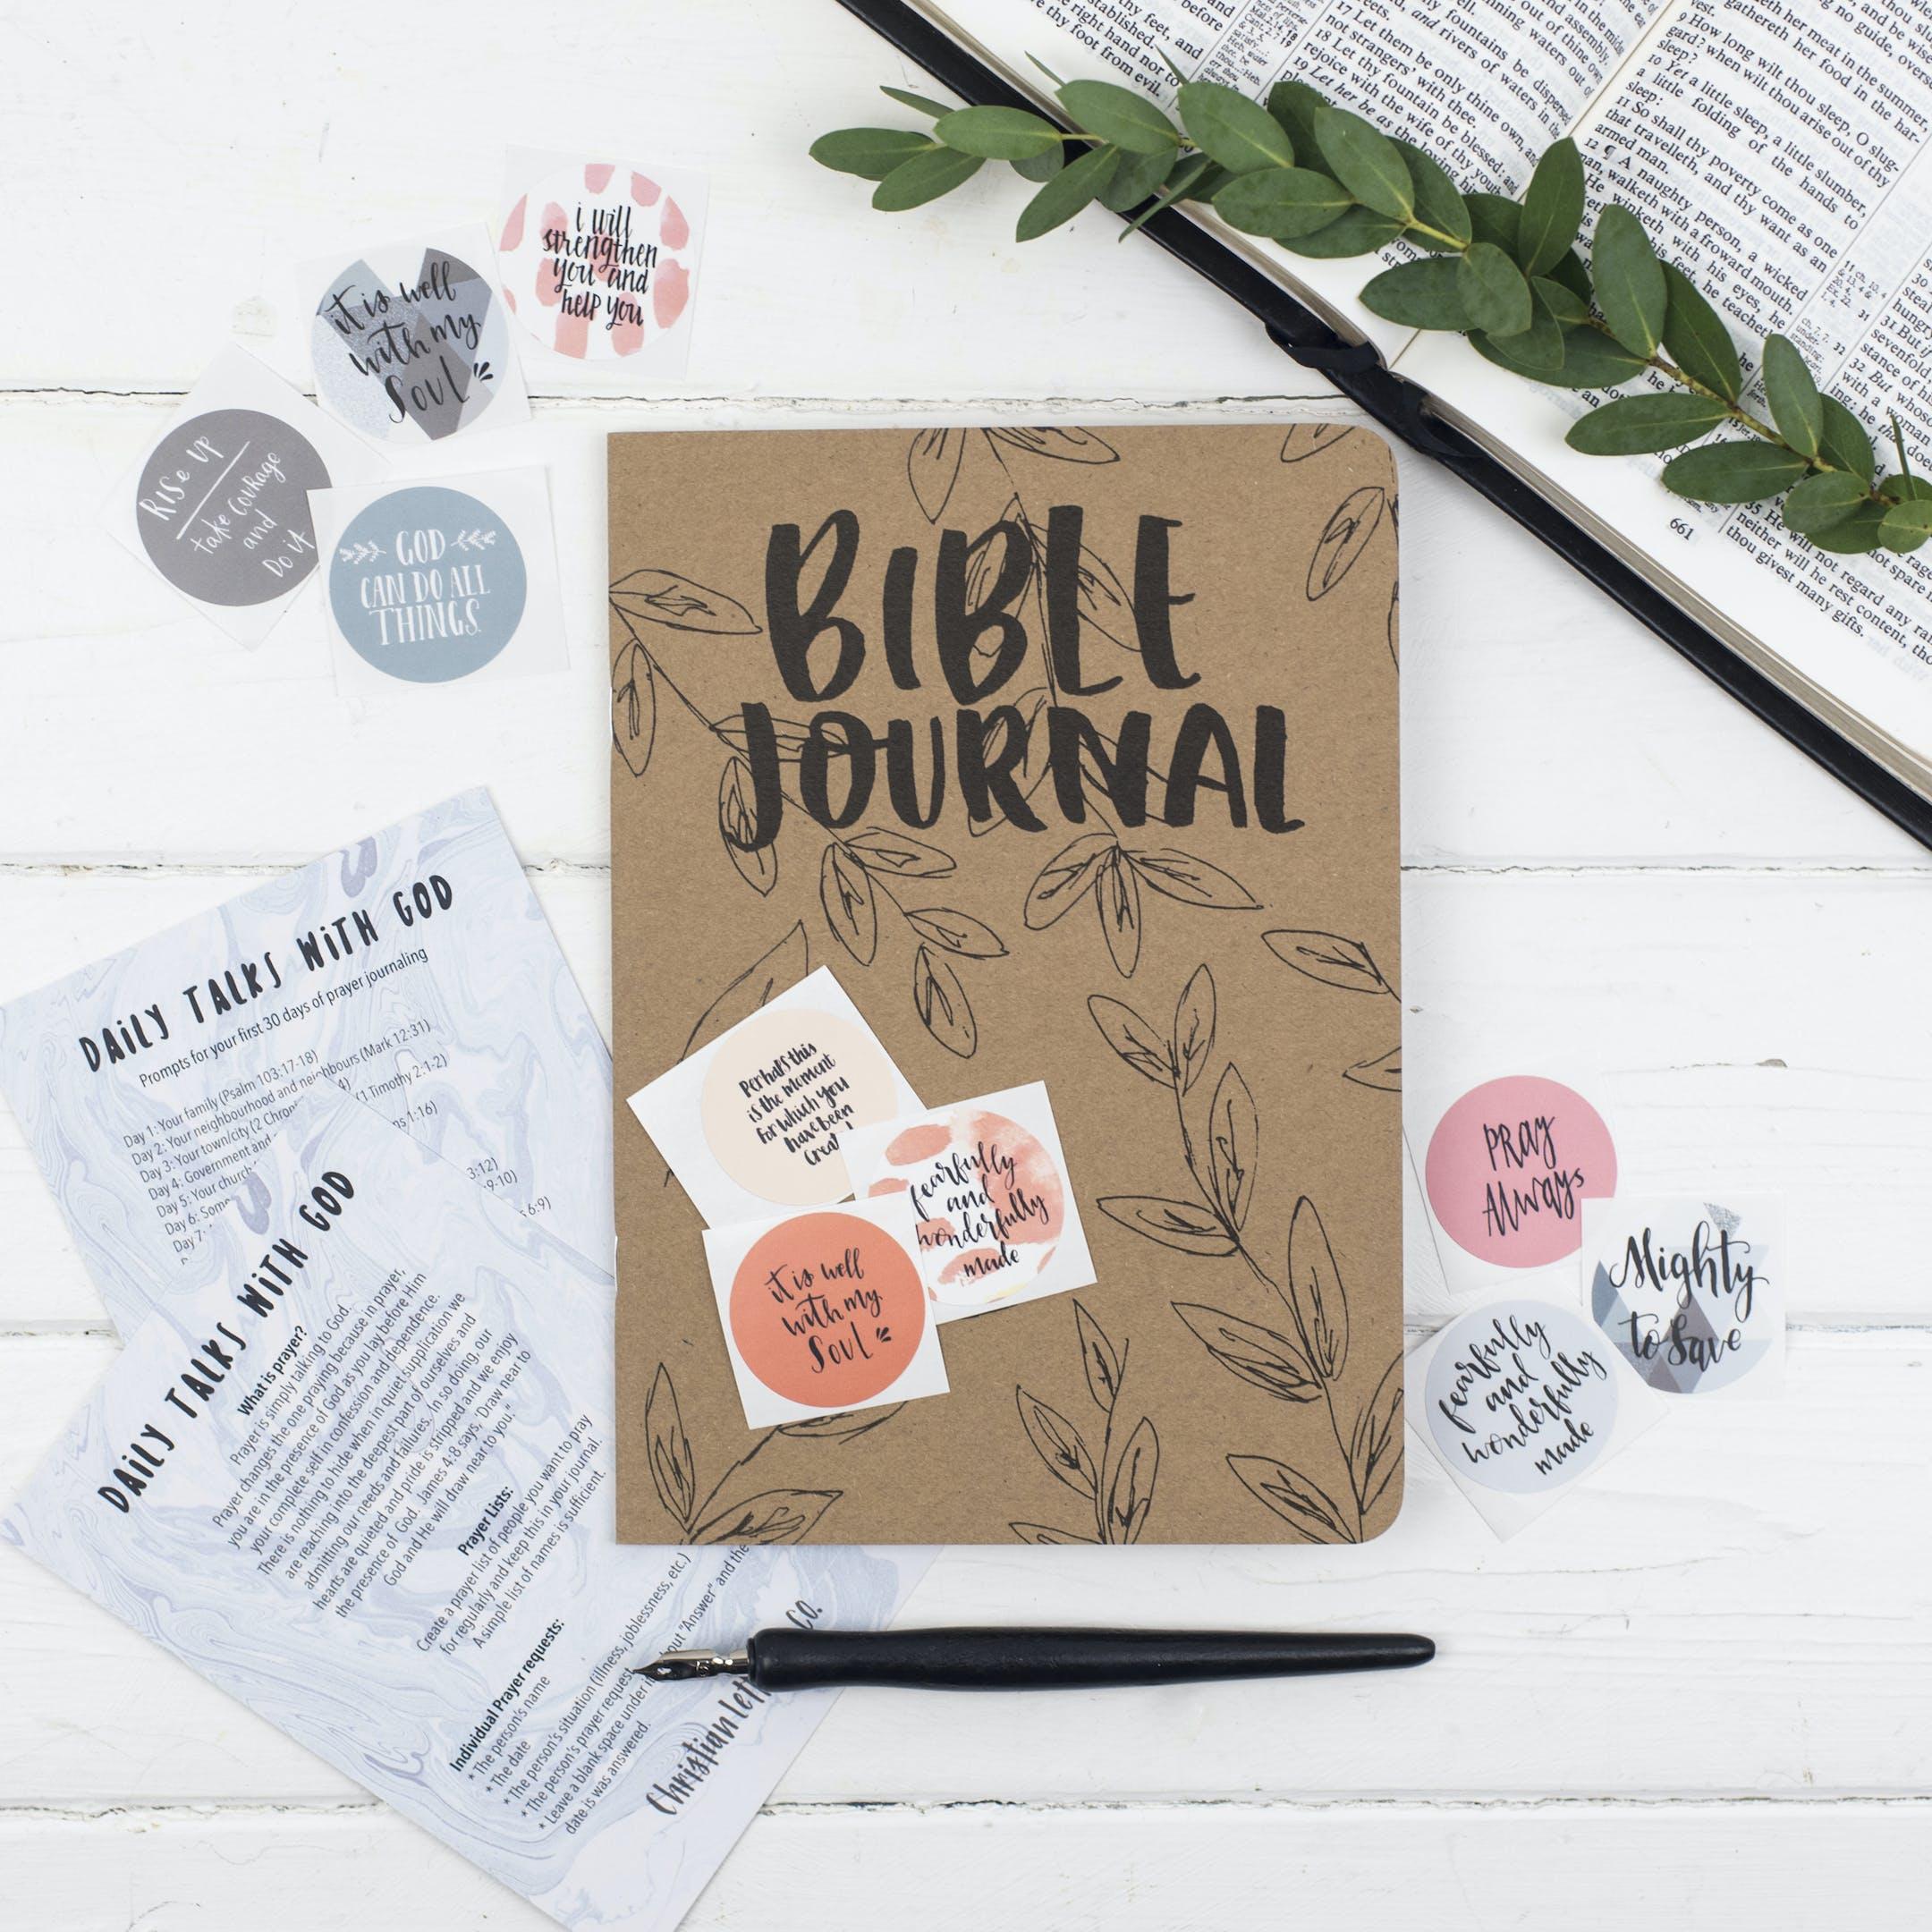 Christian Lettering Company - Bible Prayer Journal & Mixed Sticker Set